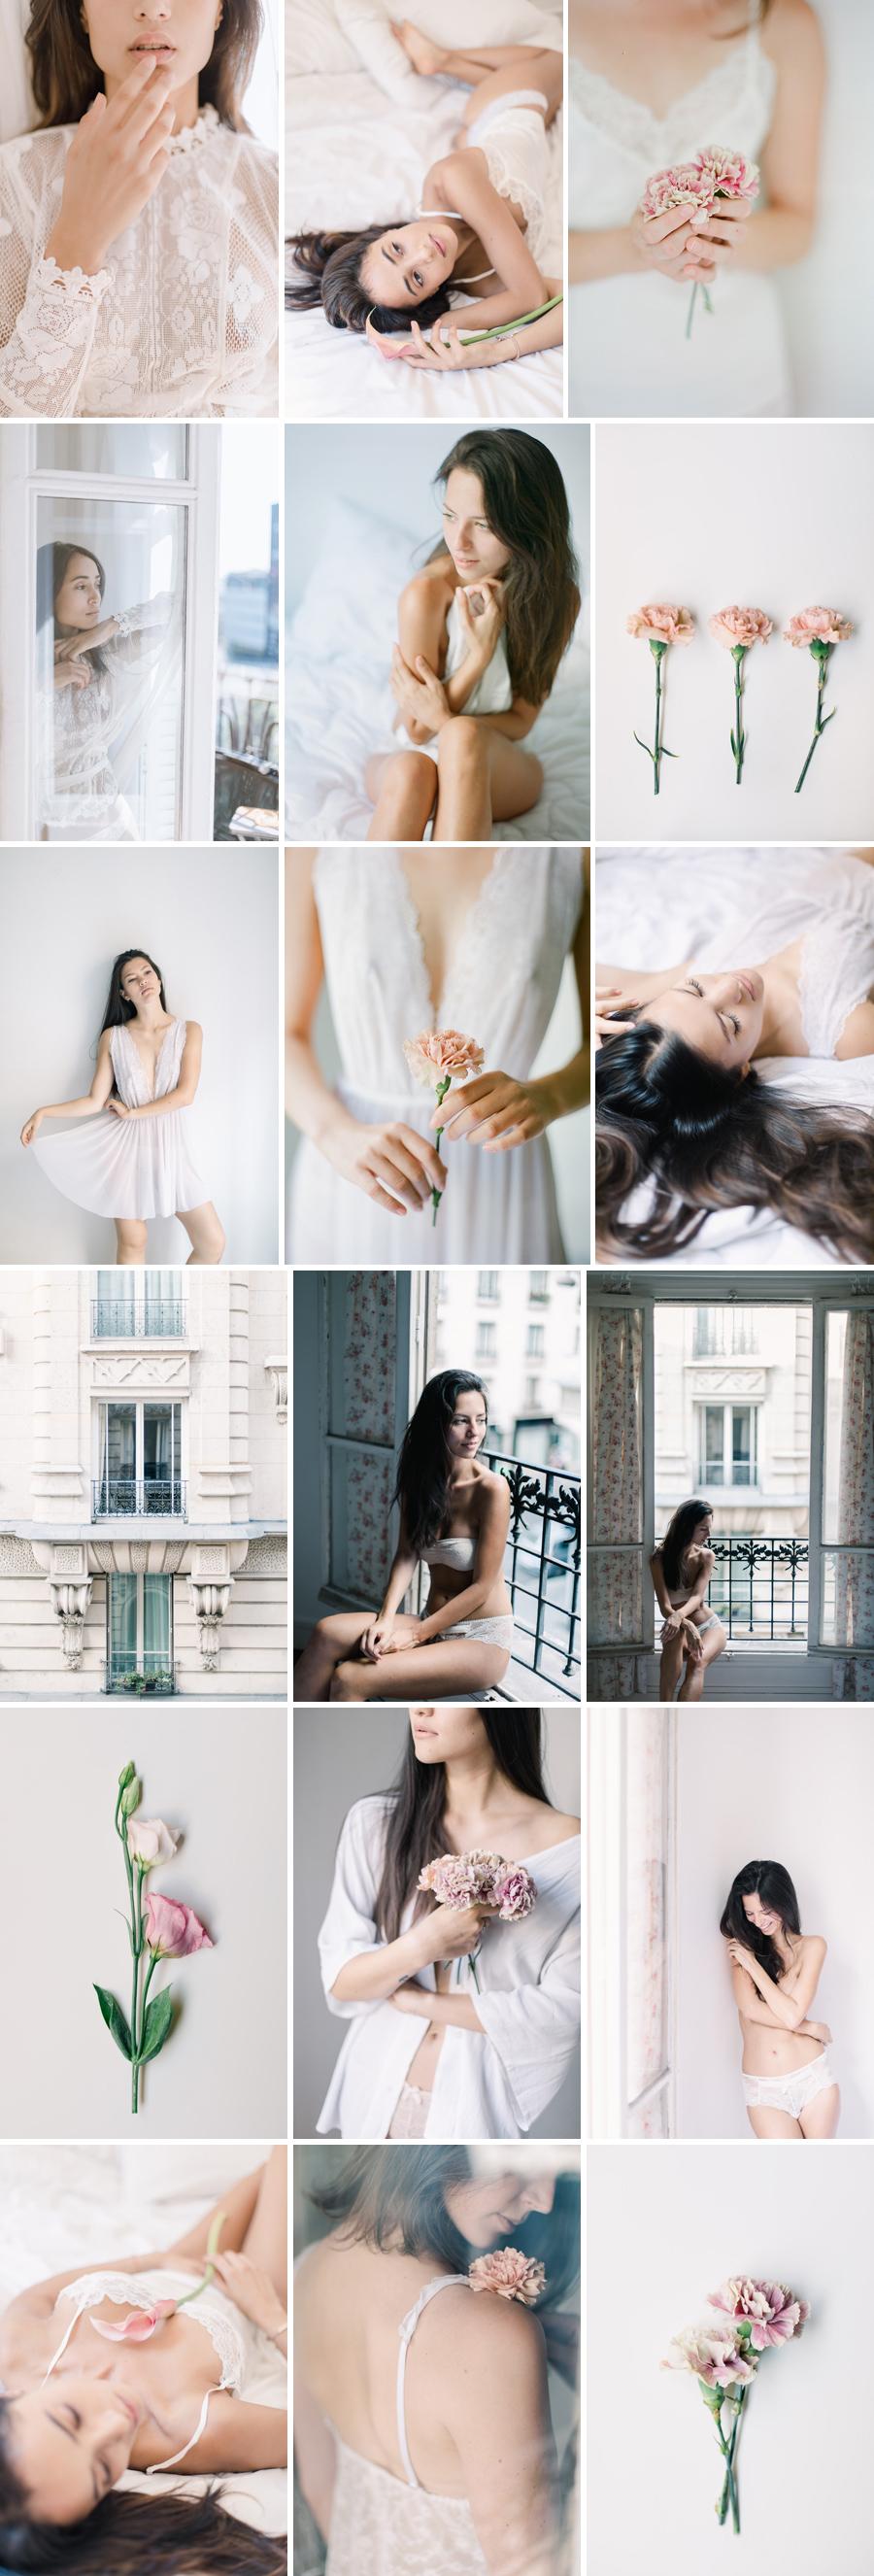 boudoir photographe photographer photography paris monaco